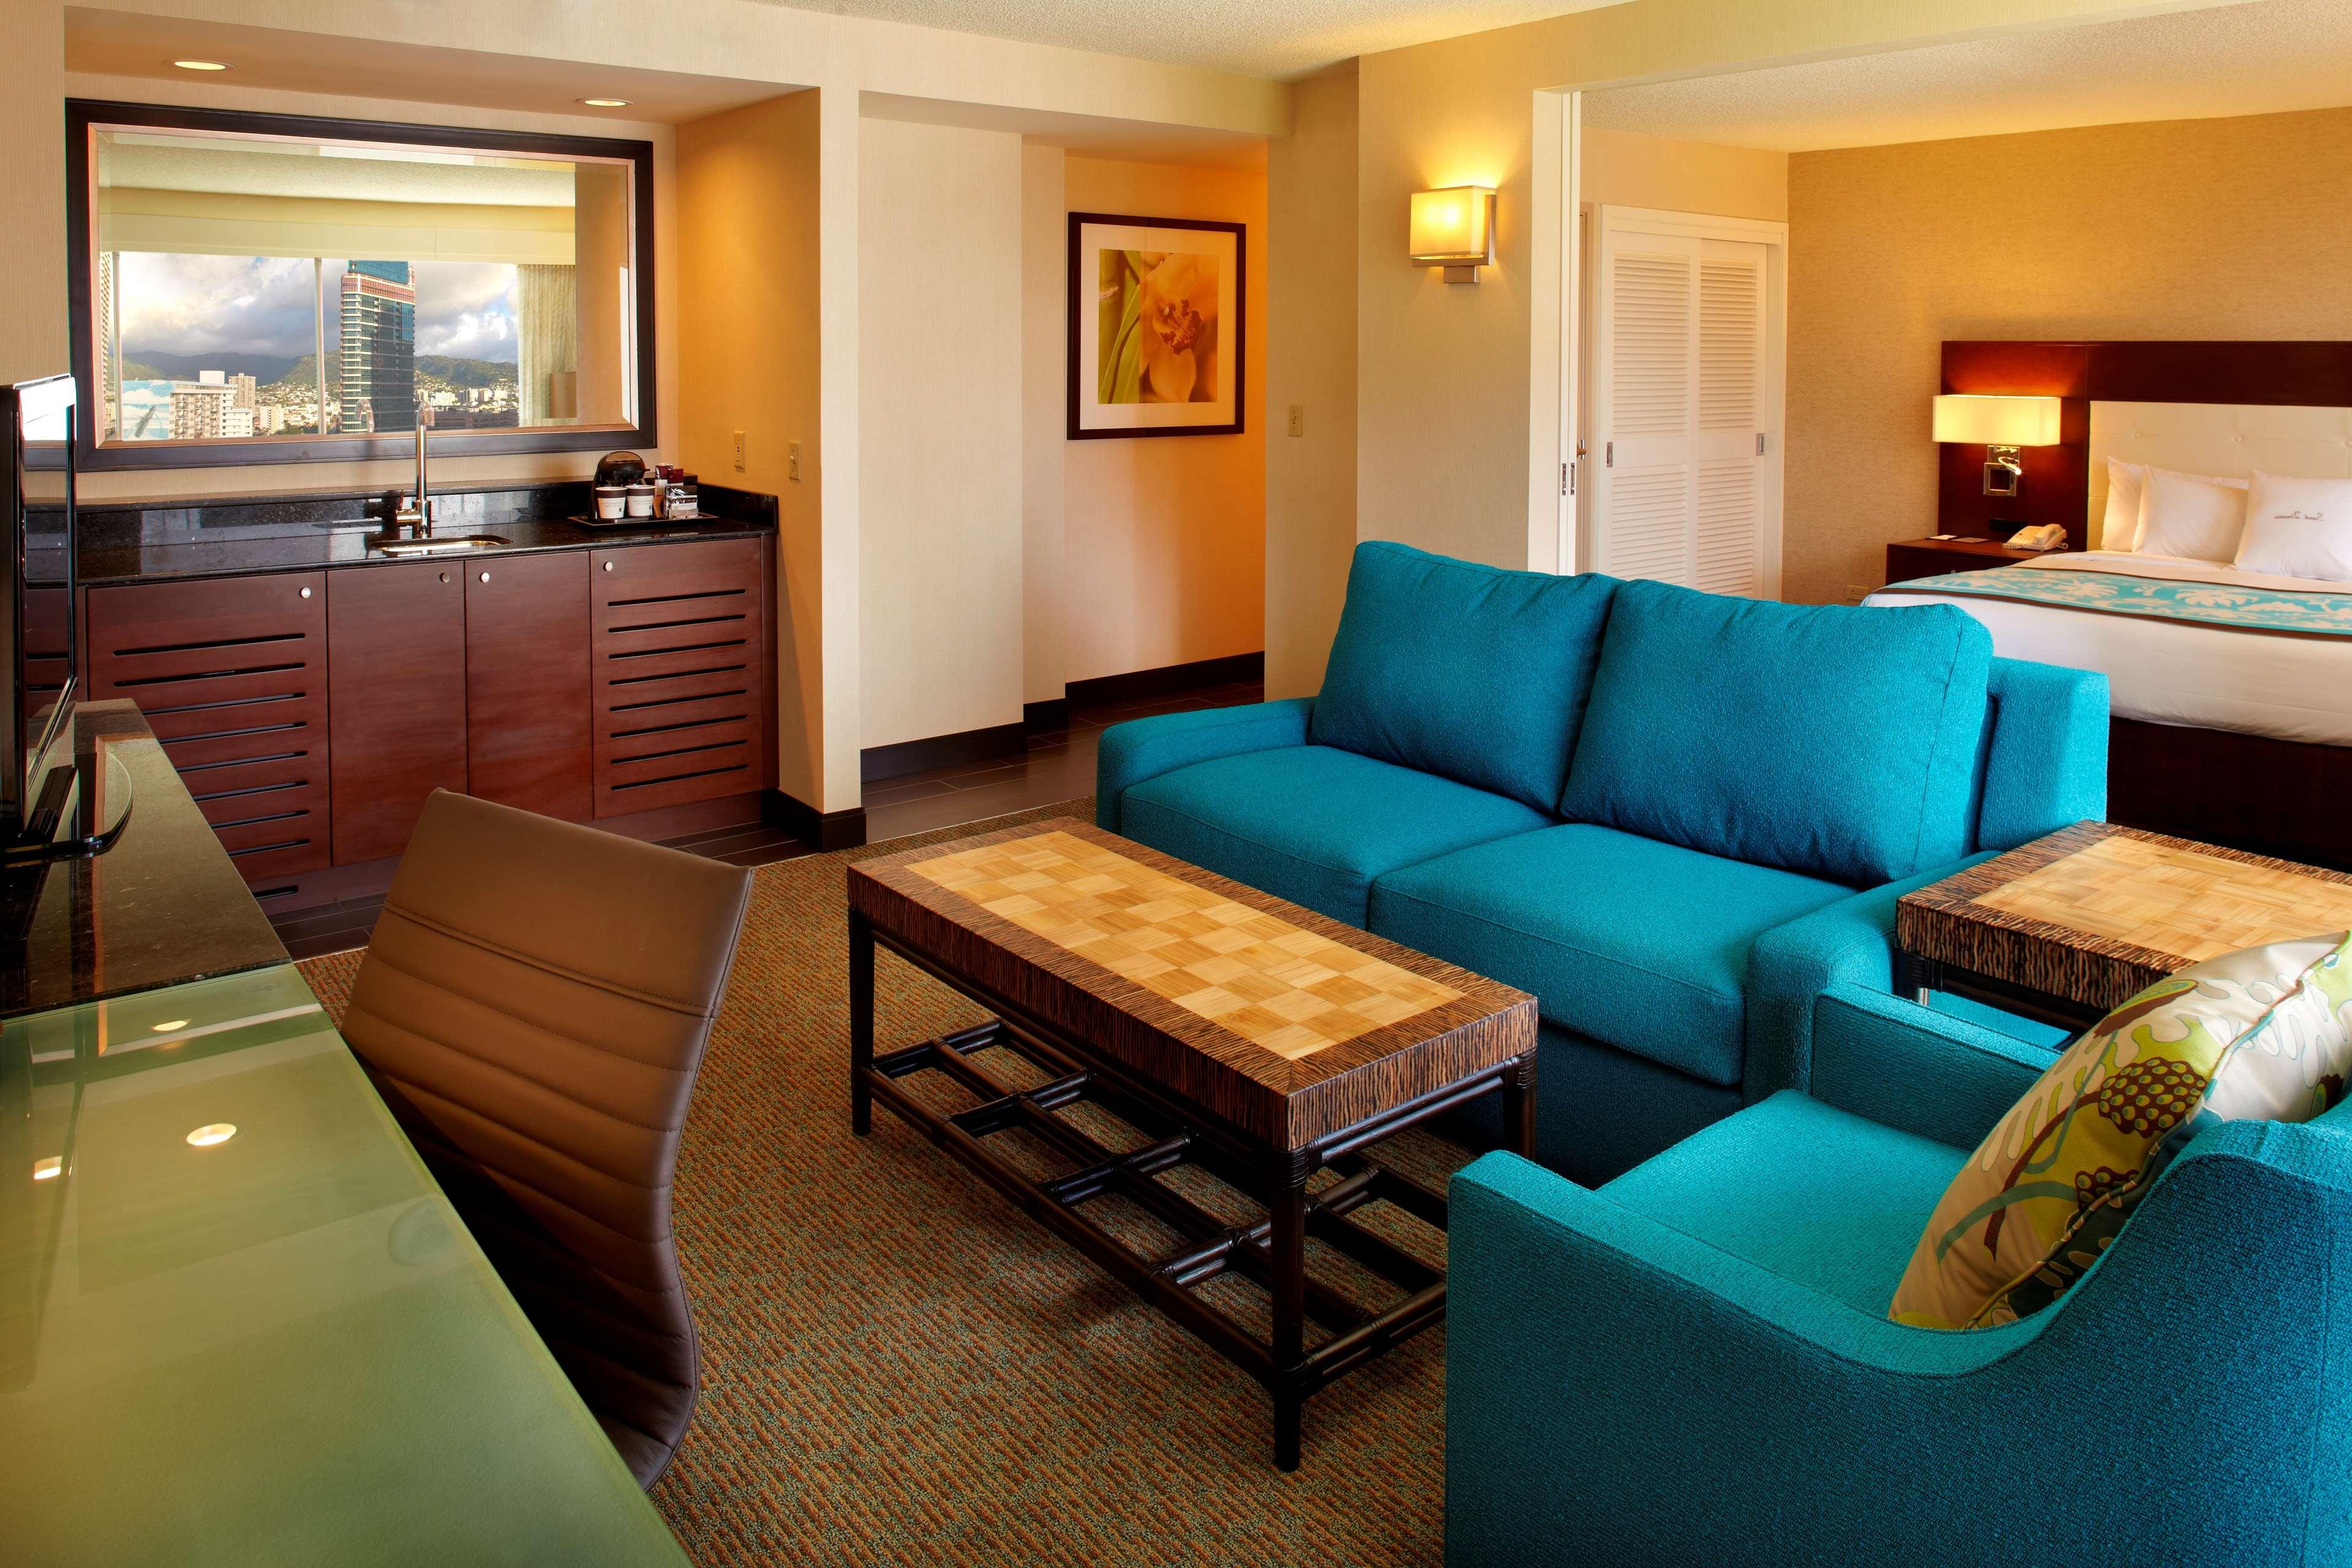 DoubleTree by Hilton Hotel Alana - Waikiki Beach image 23